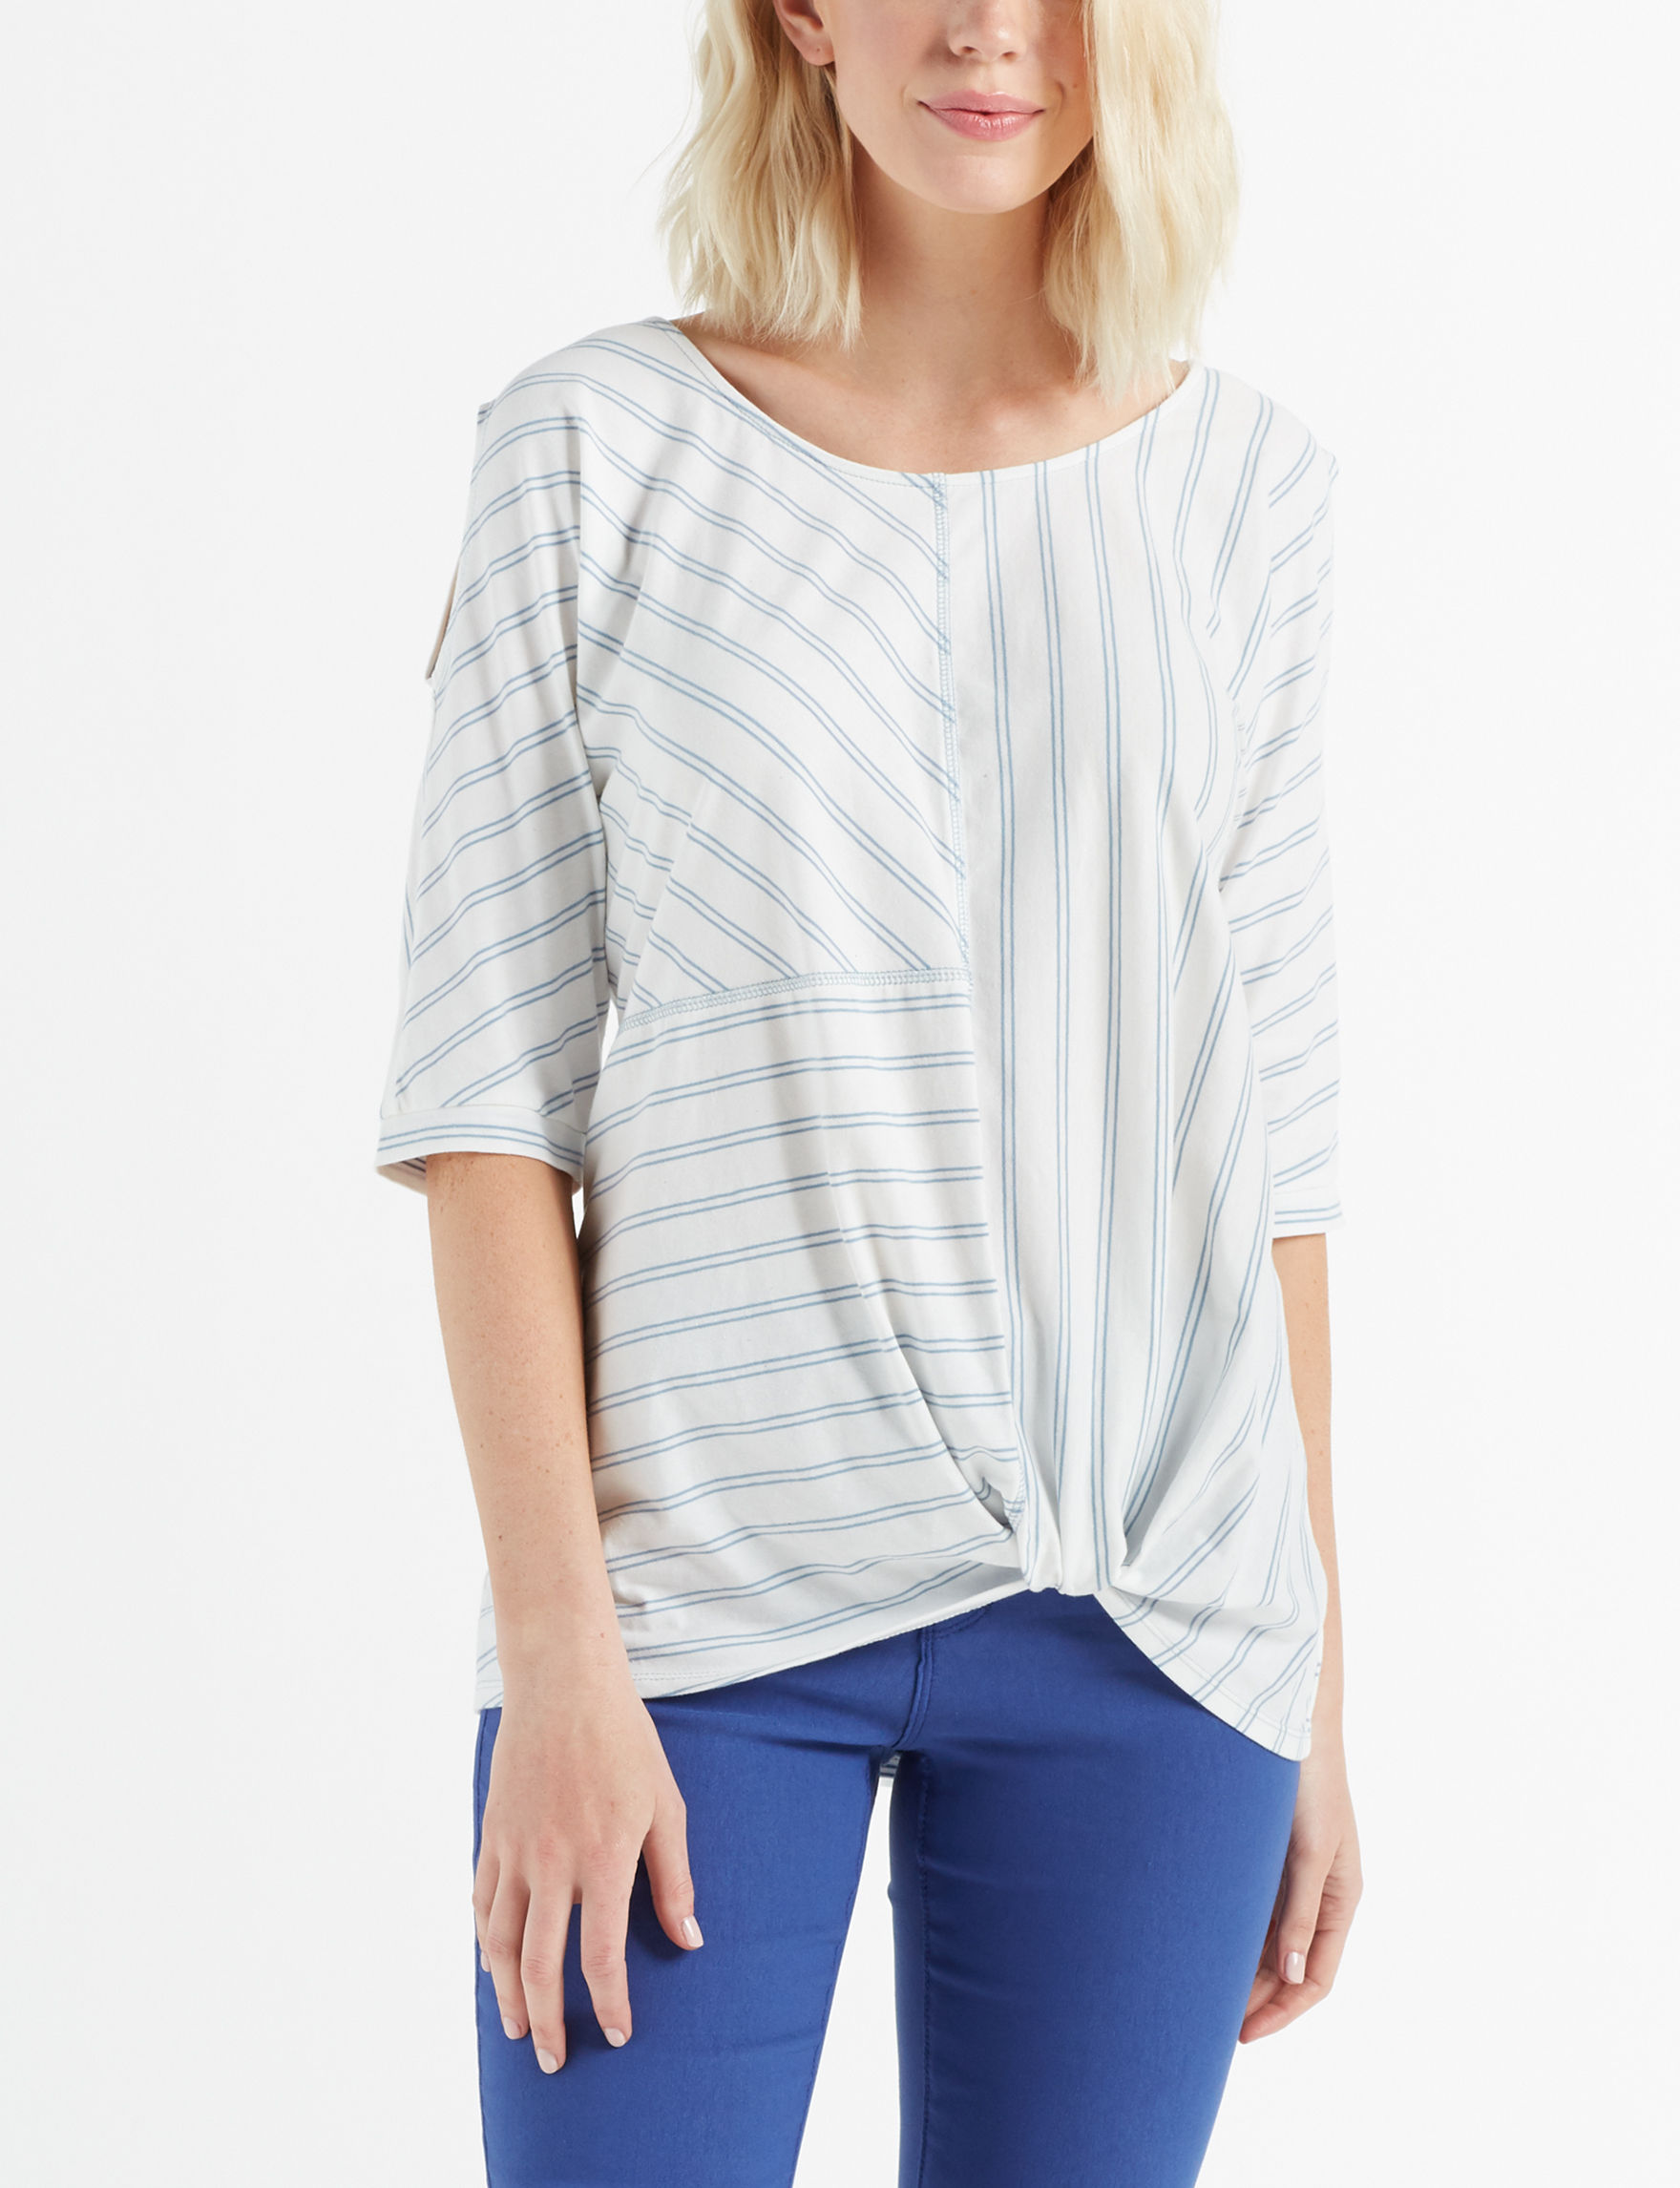 Signature Studio White / Blue Shirts & Blouses